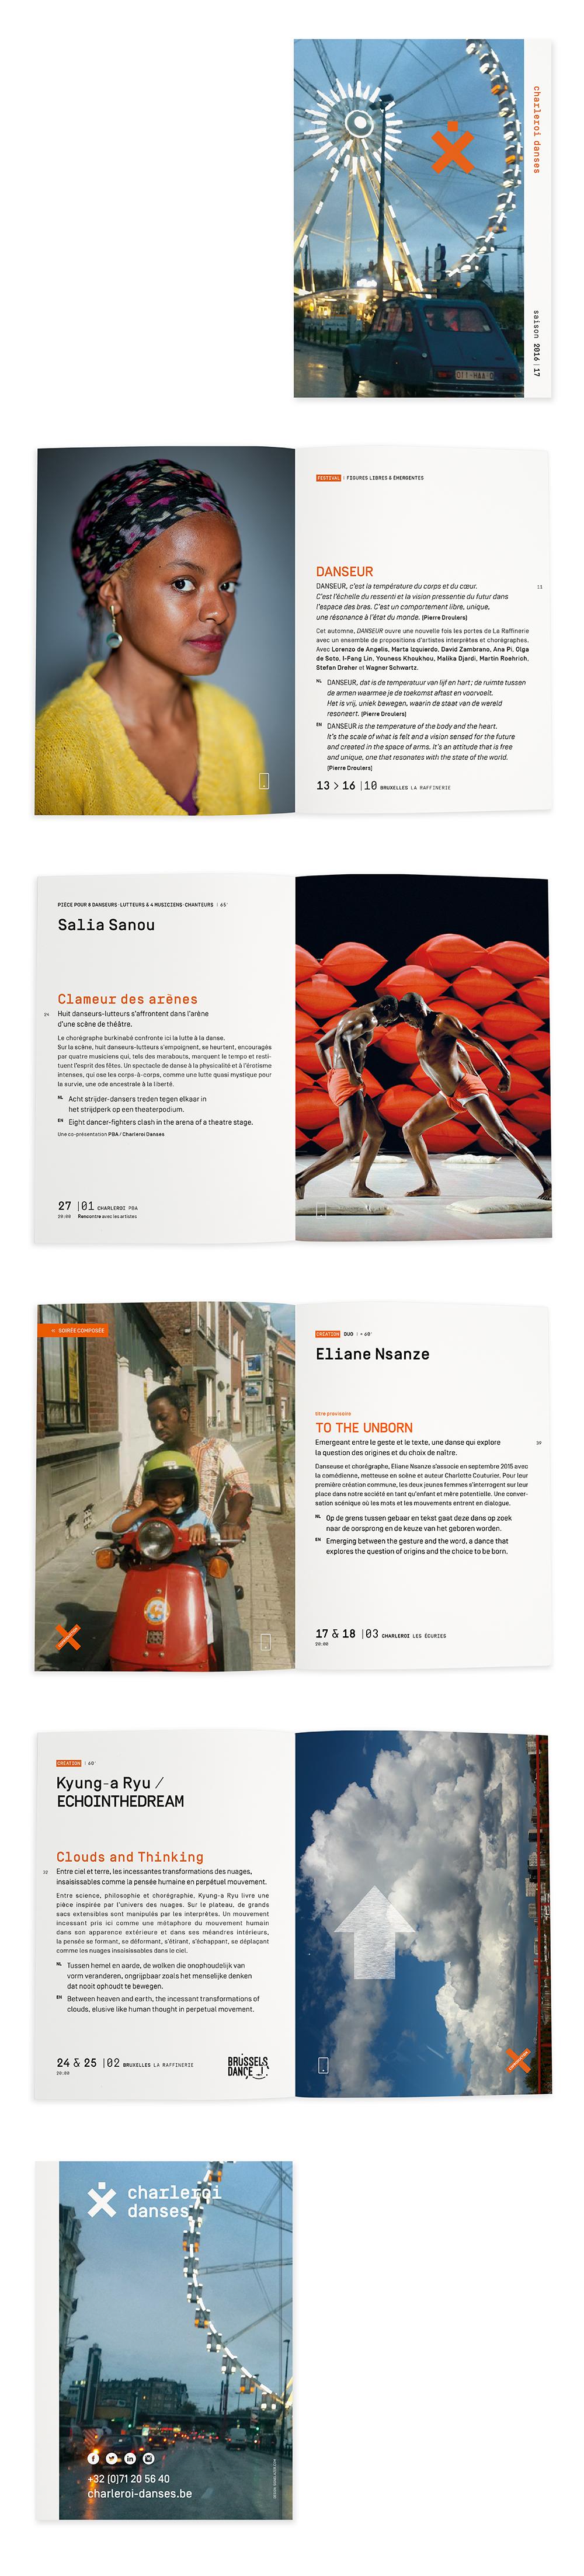 Charleroi Danses <em> — Brochure Saison 2016-2017</em>